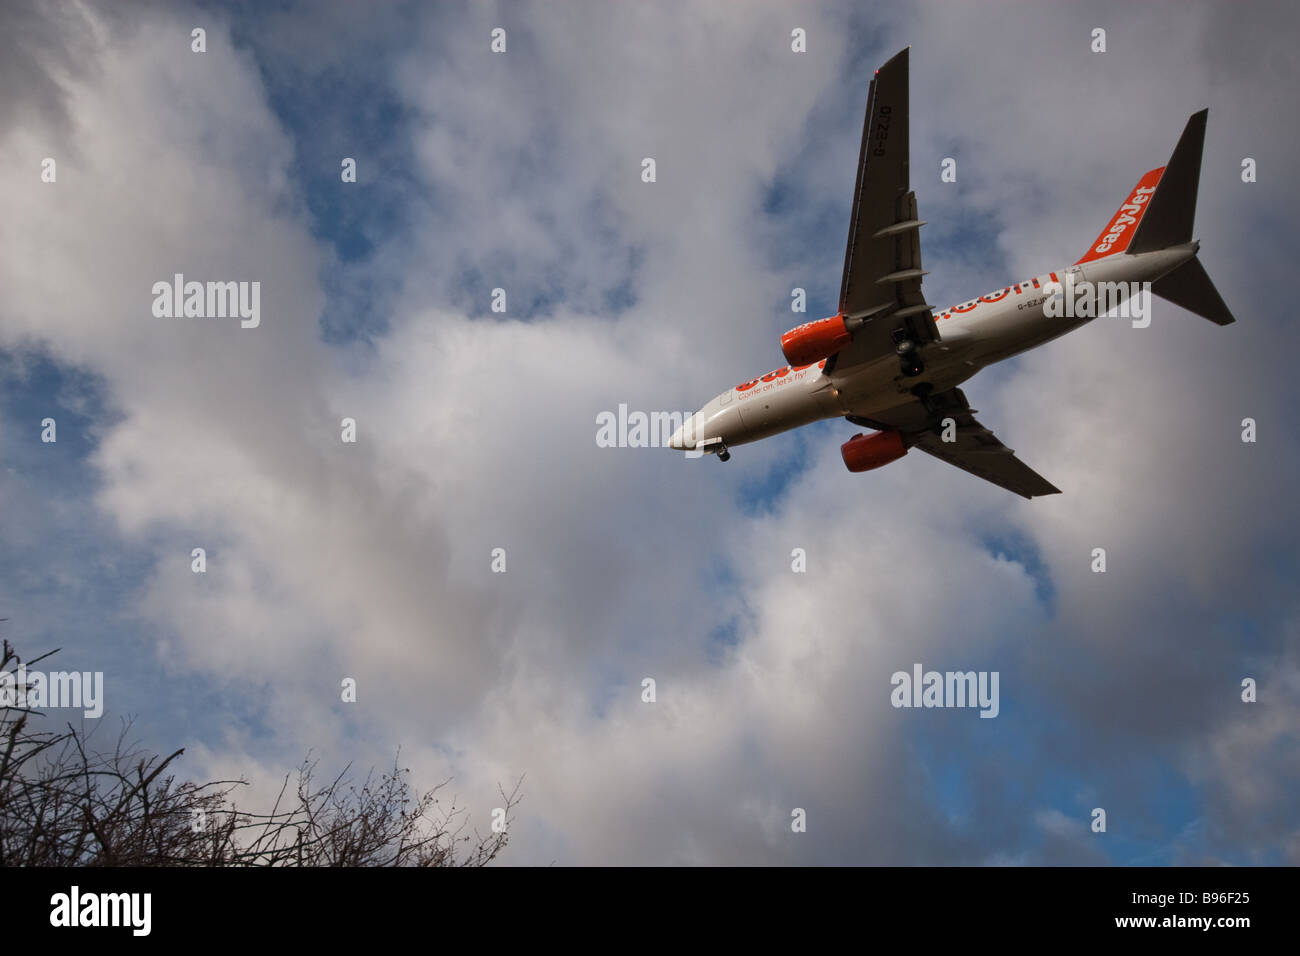 Easyjet Aircraft landing at Luton Airport - Stock Image